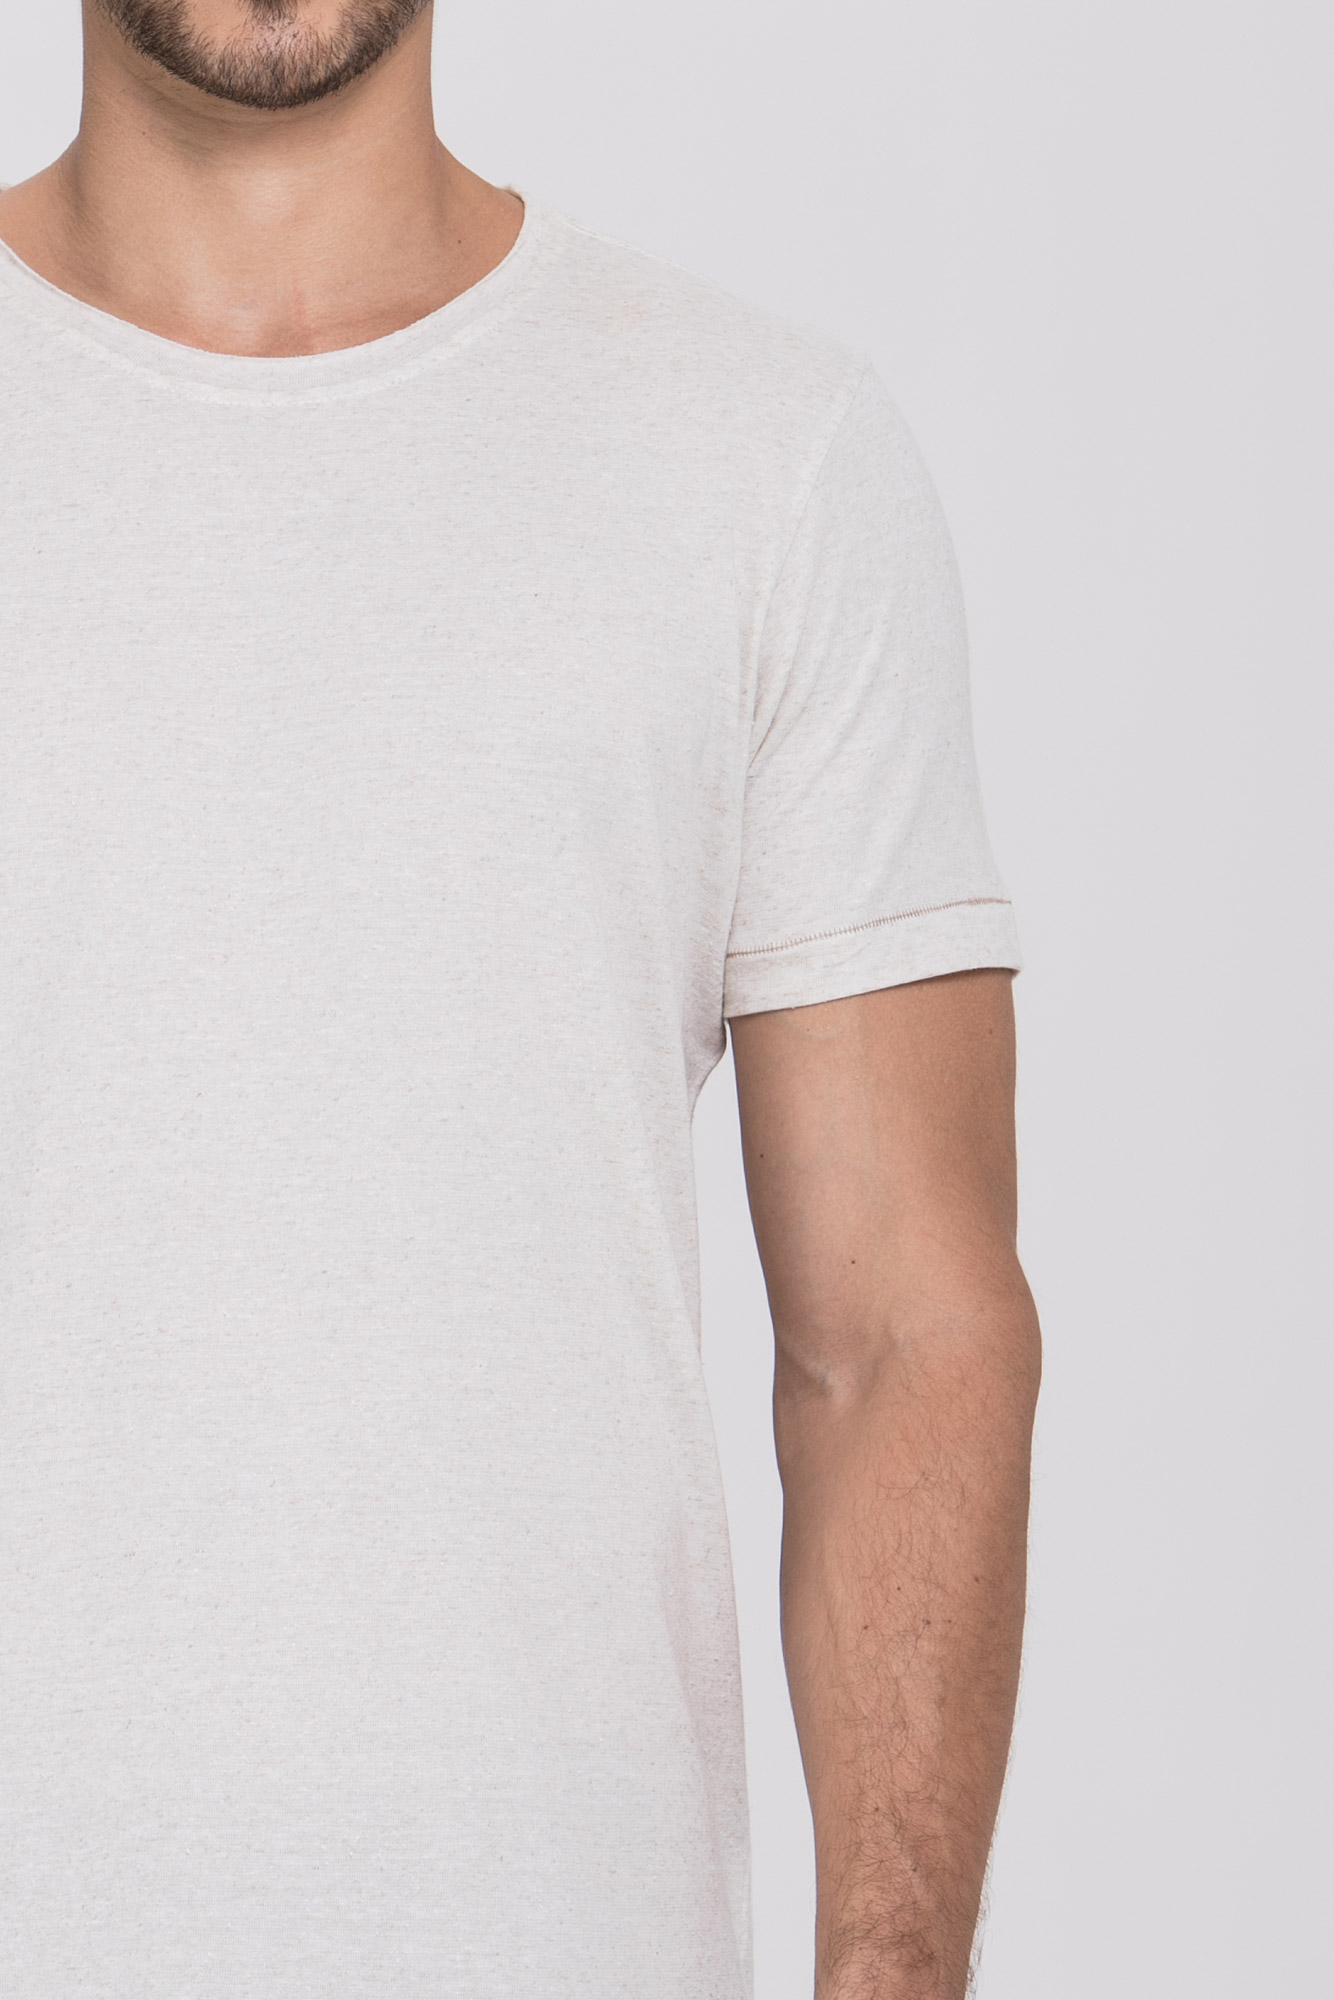 Camiseta Correct Plant